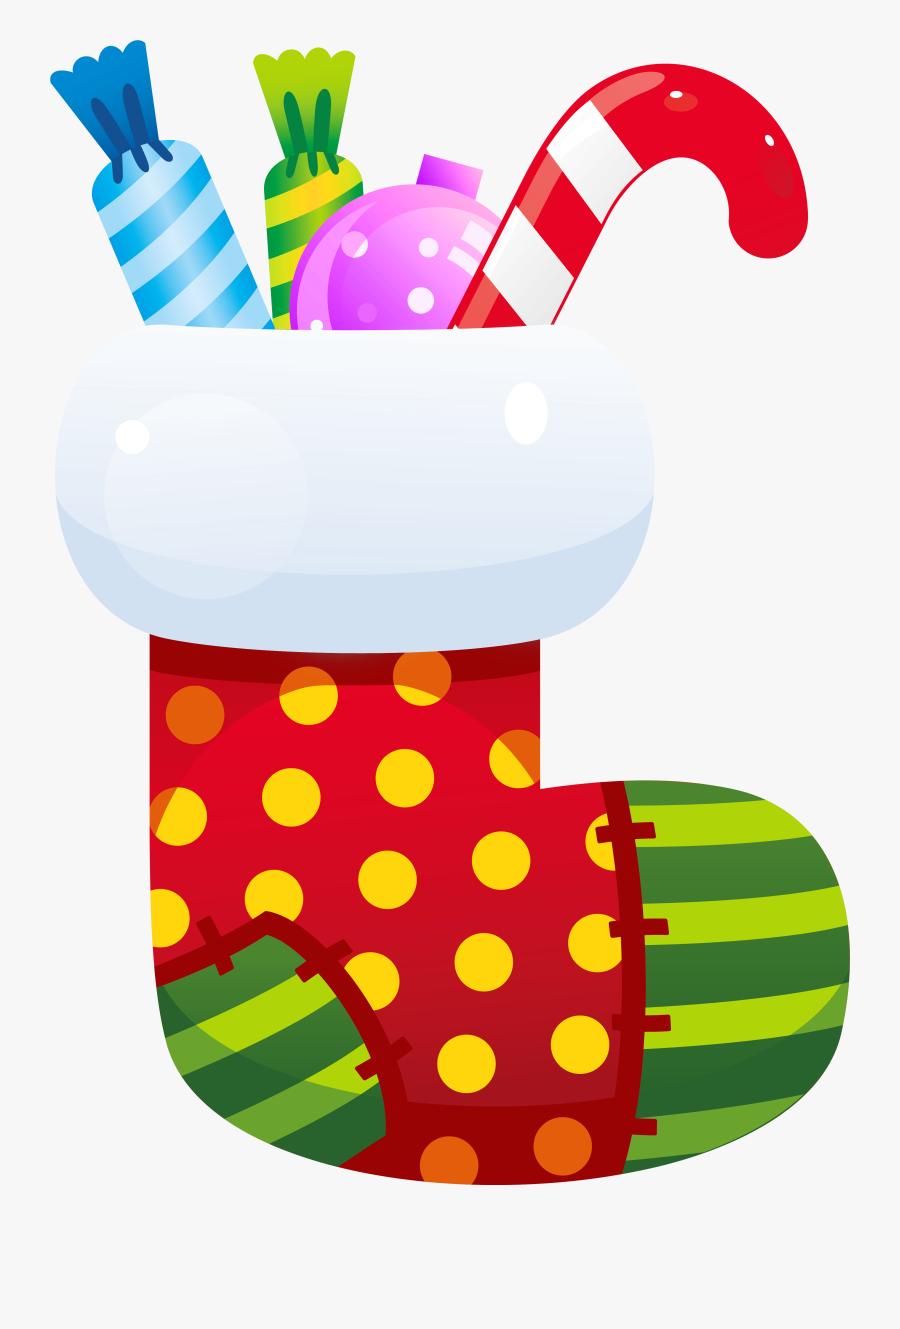 Socks Clipart Xmas - Transparent Christmas Stocking Clipart, Transparent Clipart